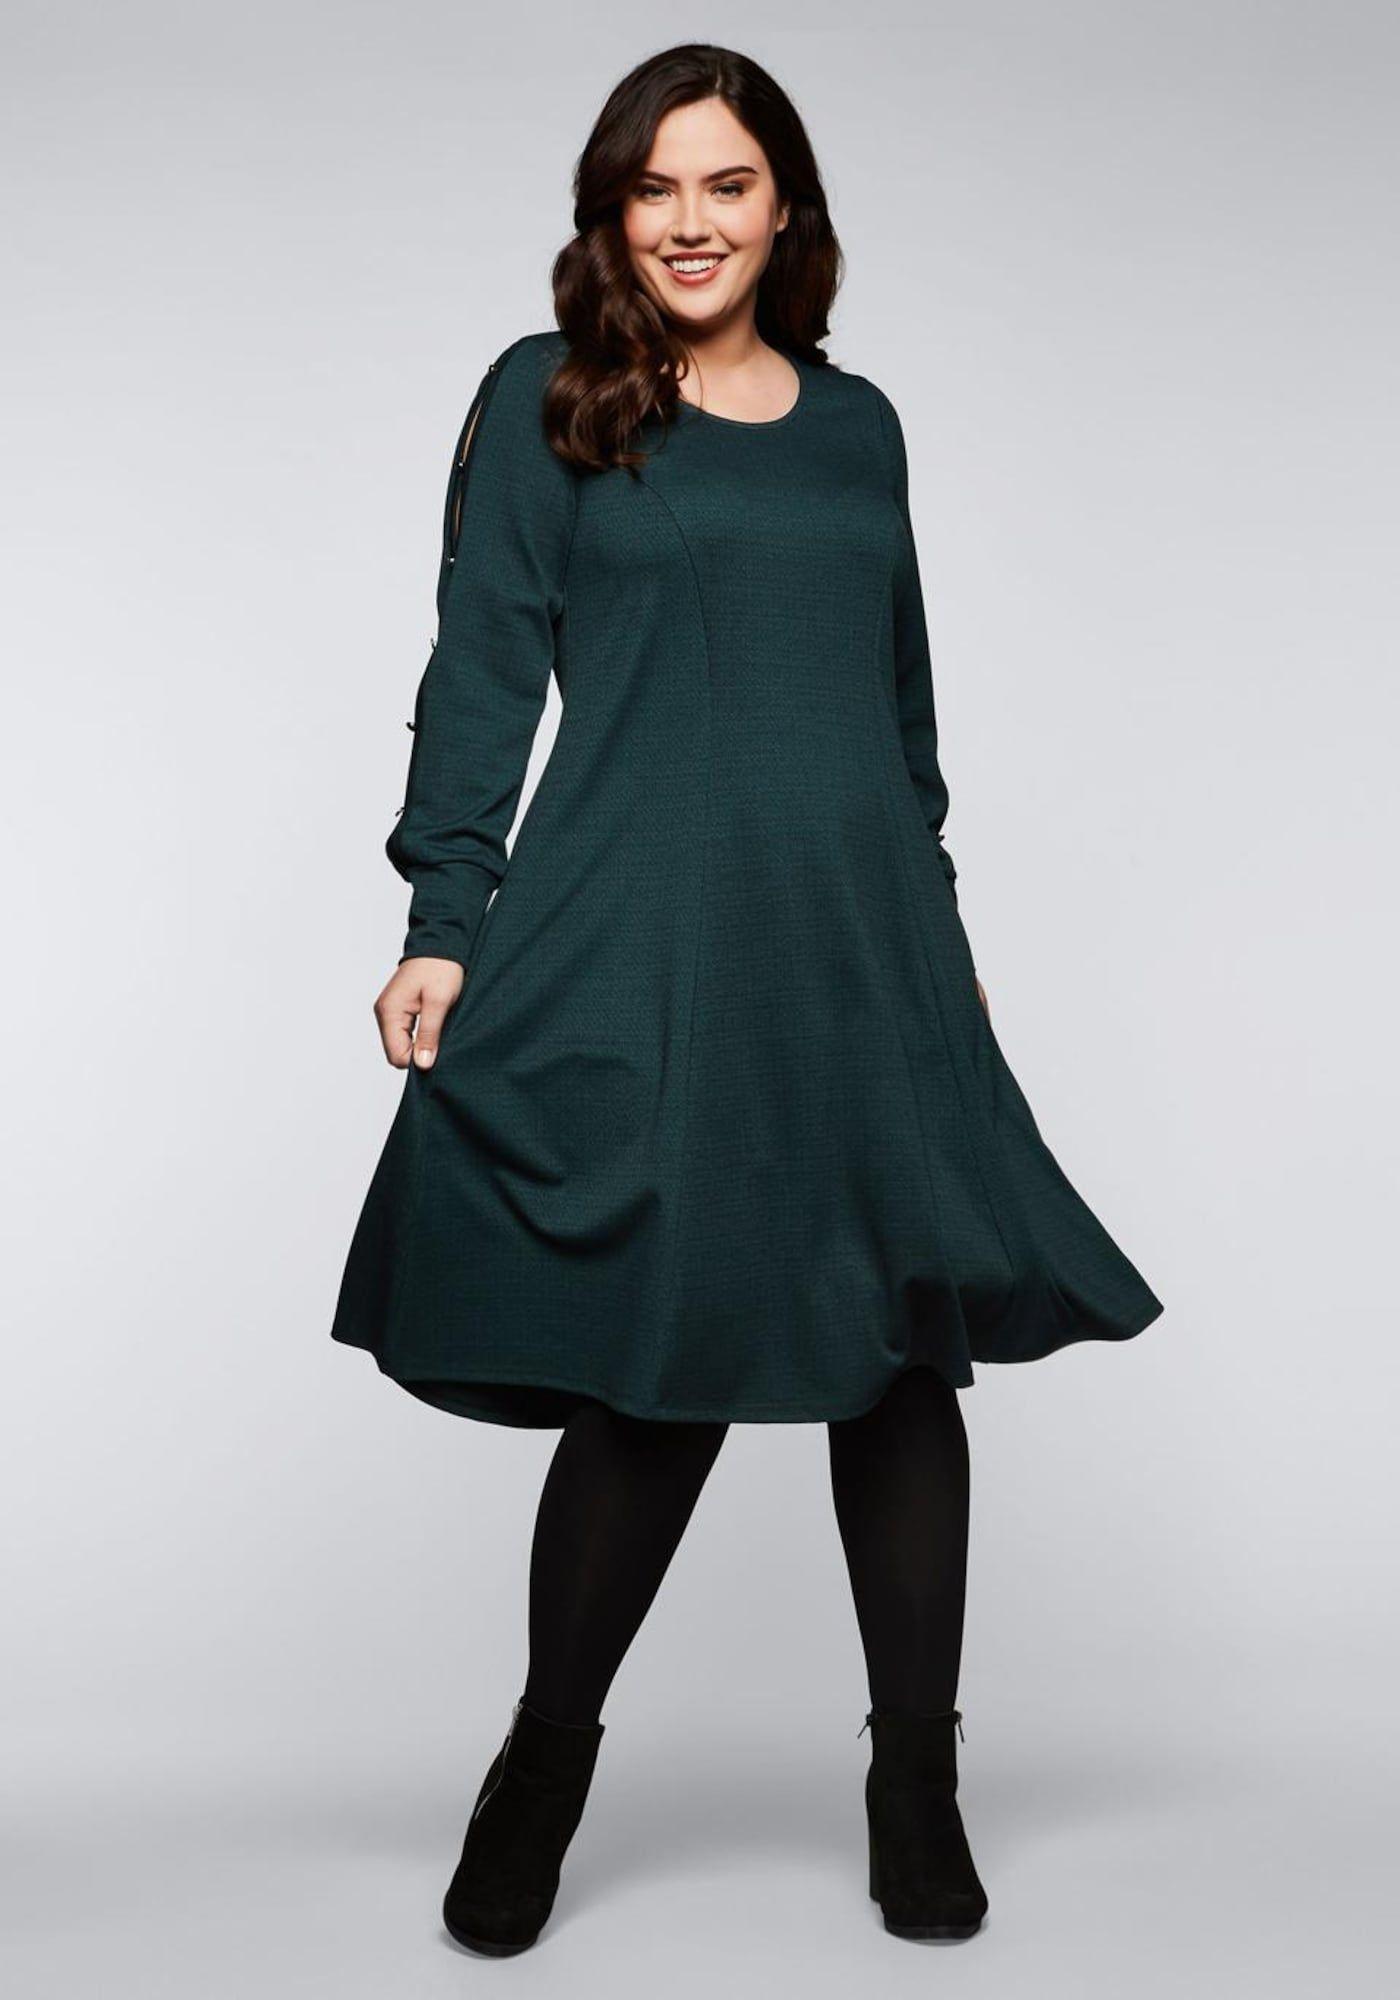 SHEEGO Kleid Damen, Smaragd, Größe 14  Karokleid, Taillierte